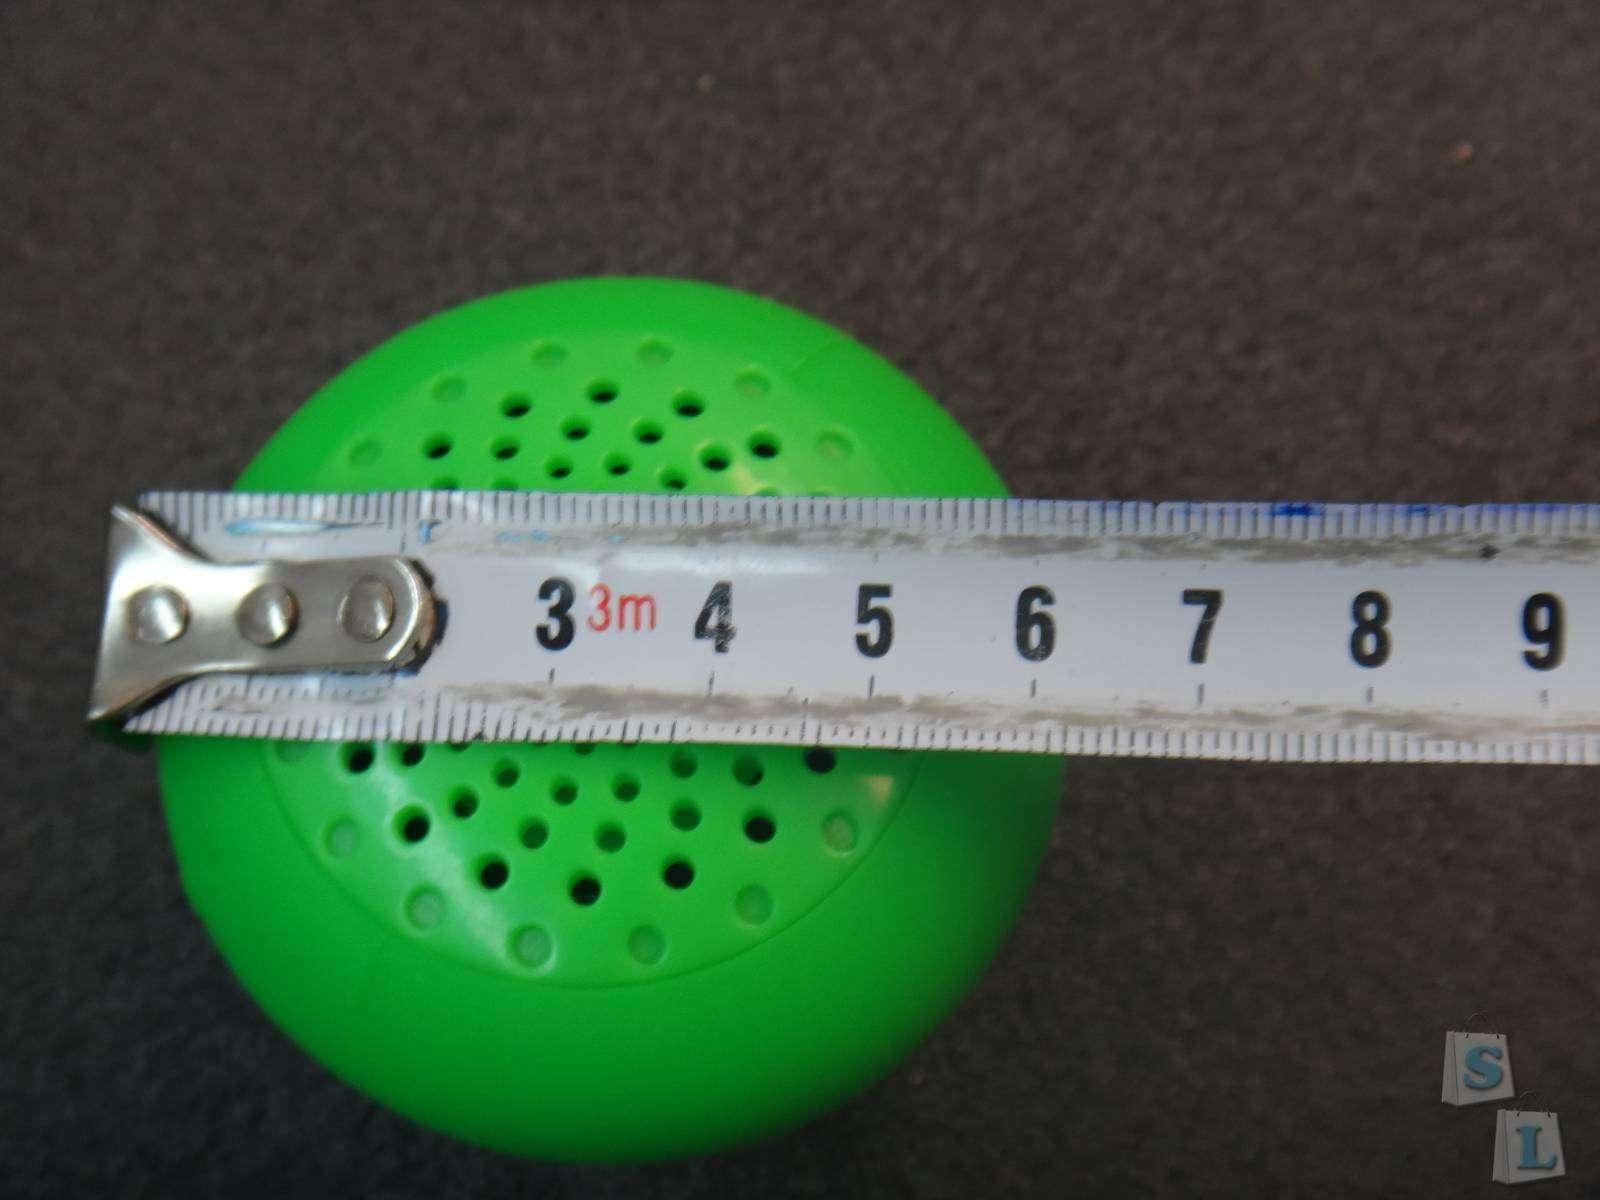 GearBest: Влагозащищенная беспроводная колонка грибок MR001 - Wireless Bluetooth Speaker обзор